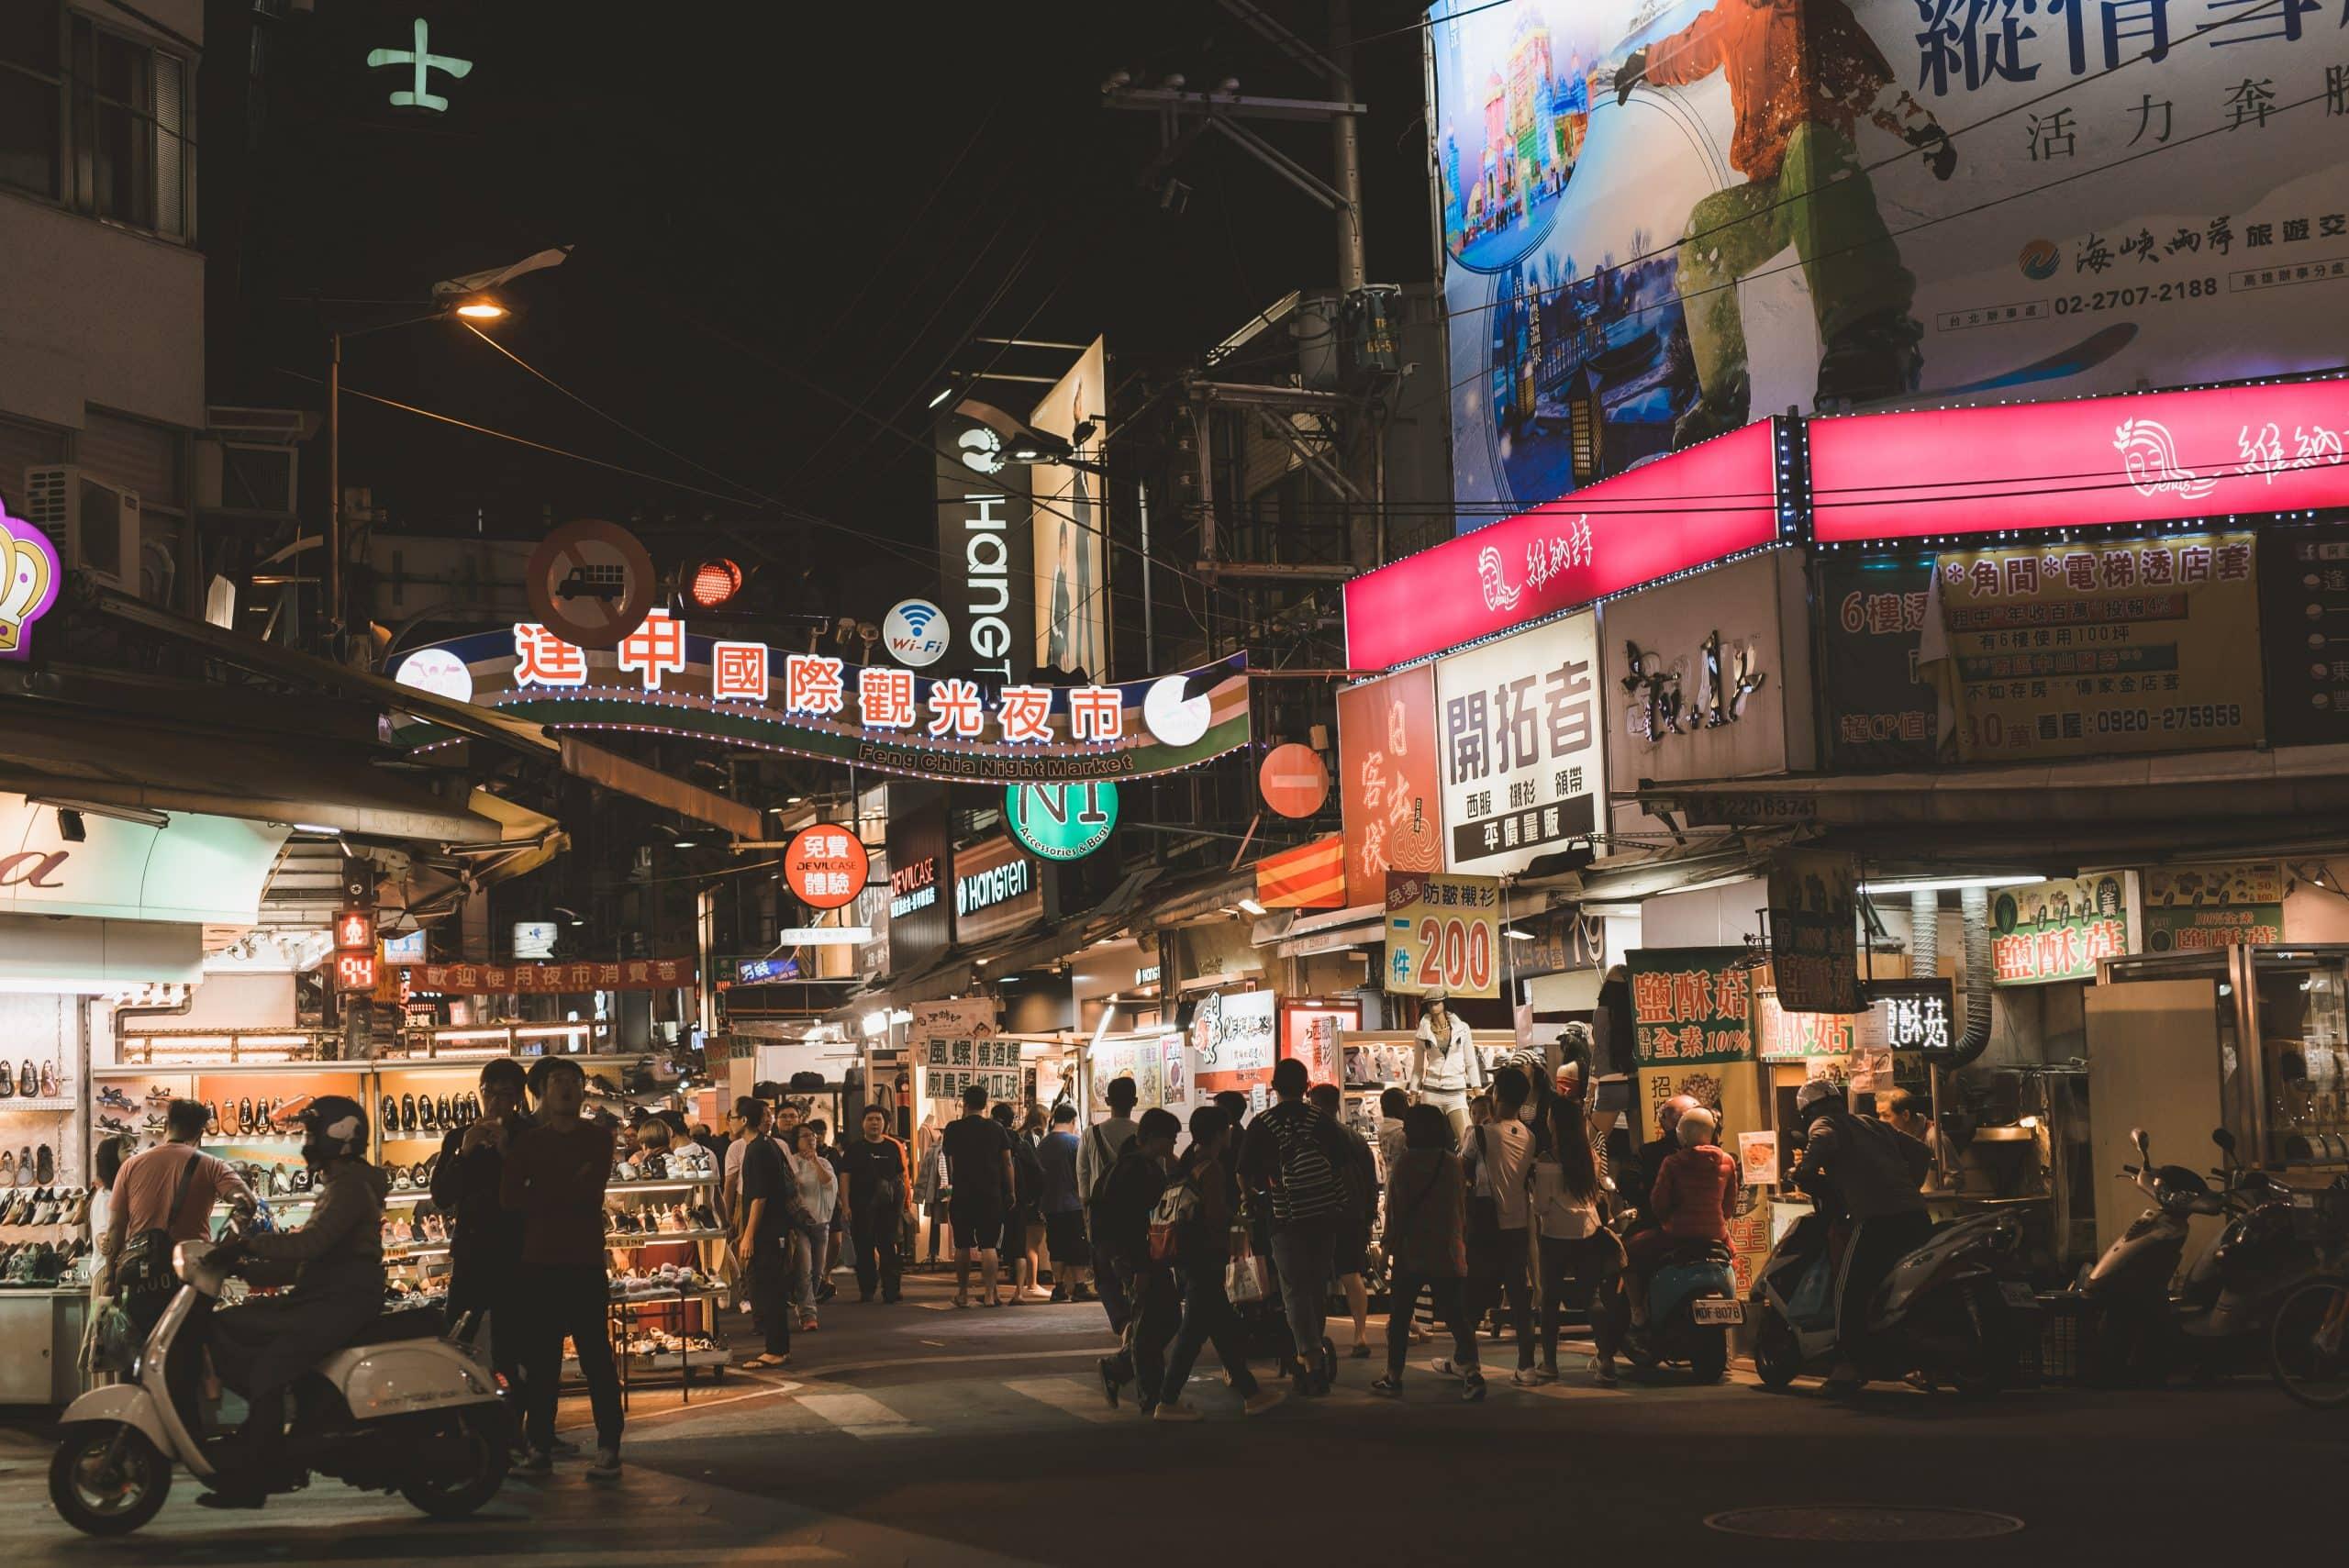 Fengjia night market, Taiwan itinerary, Taiwan itinerary